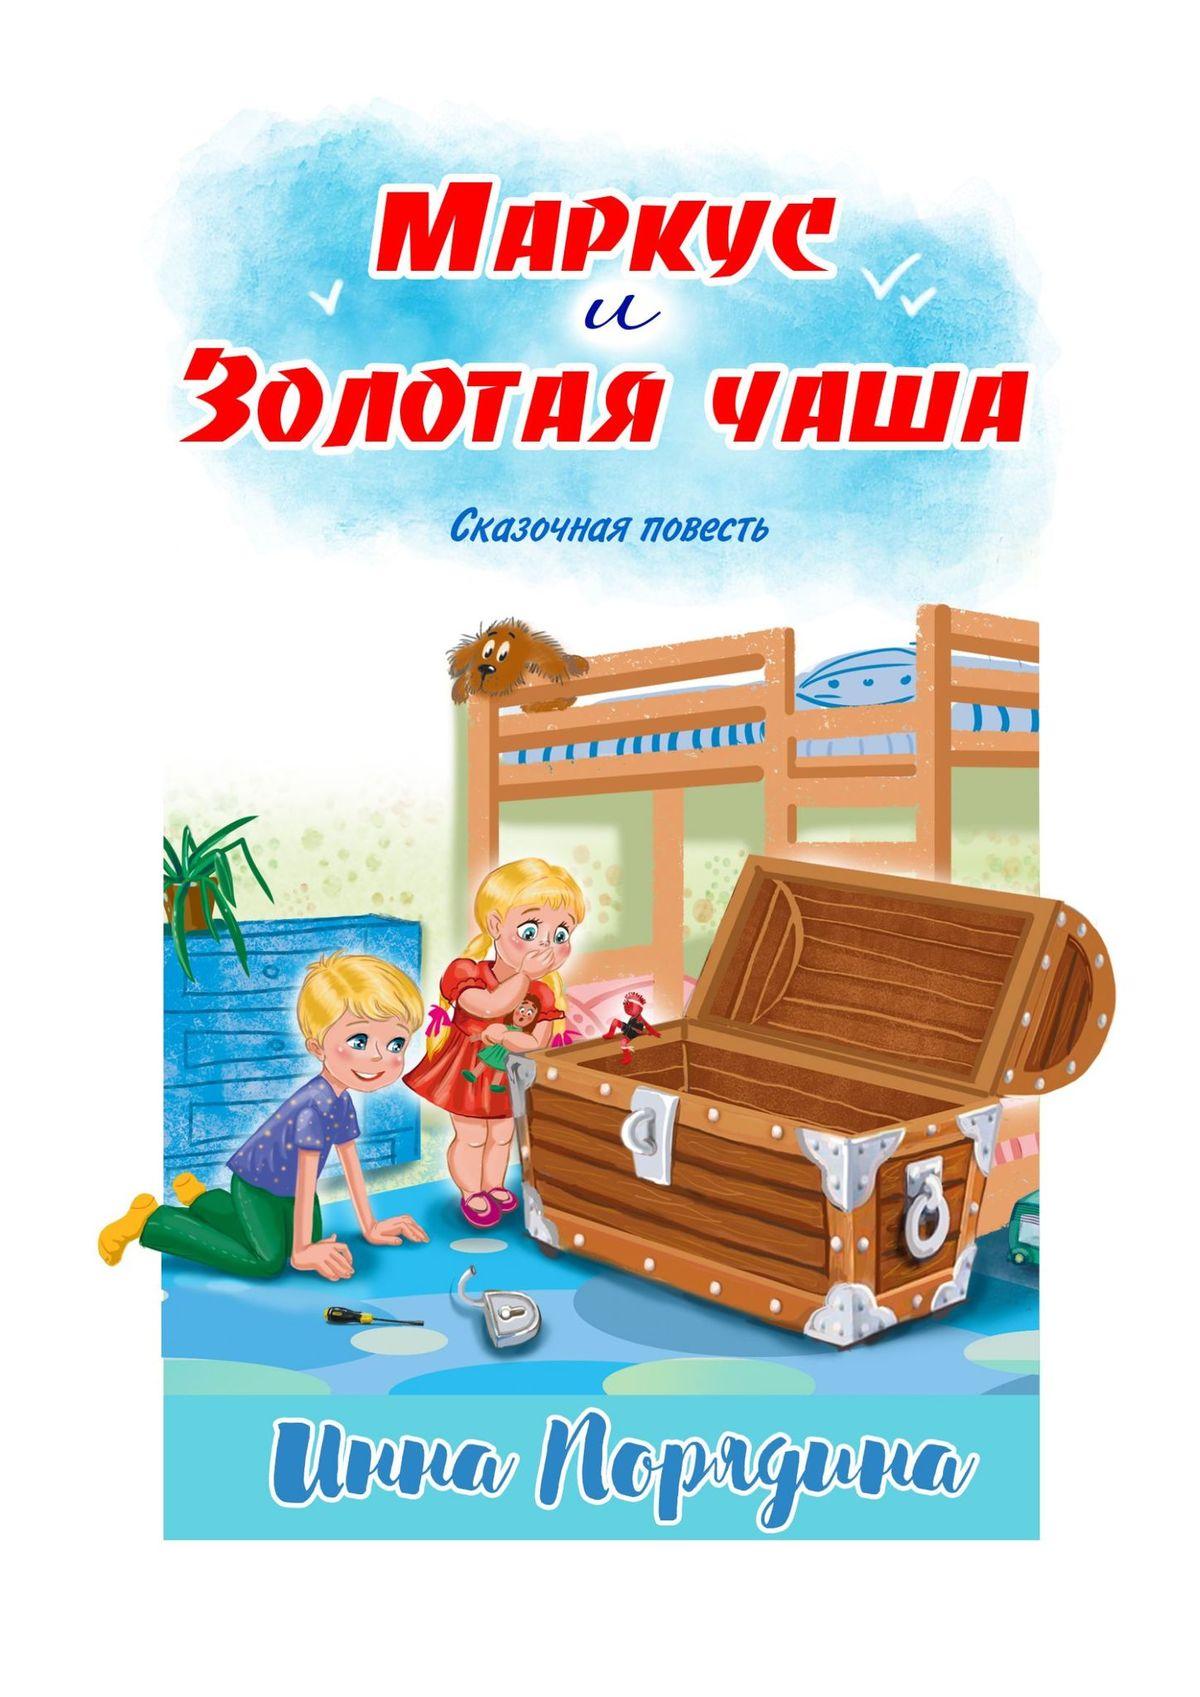 Инна Александровна Порядина Маркус изолотаячаша. Сказочная повесть